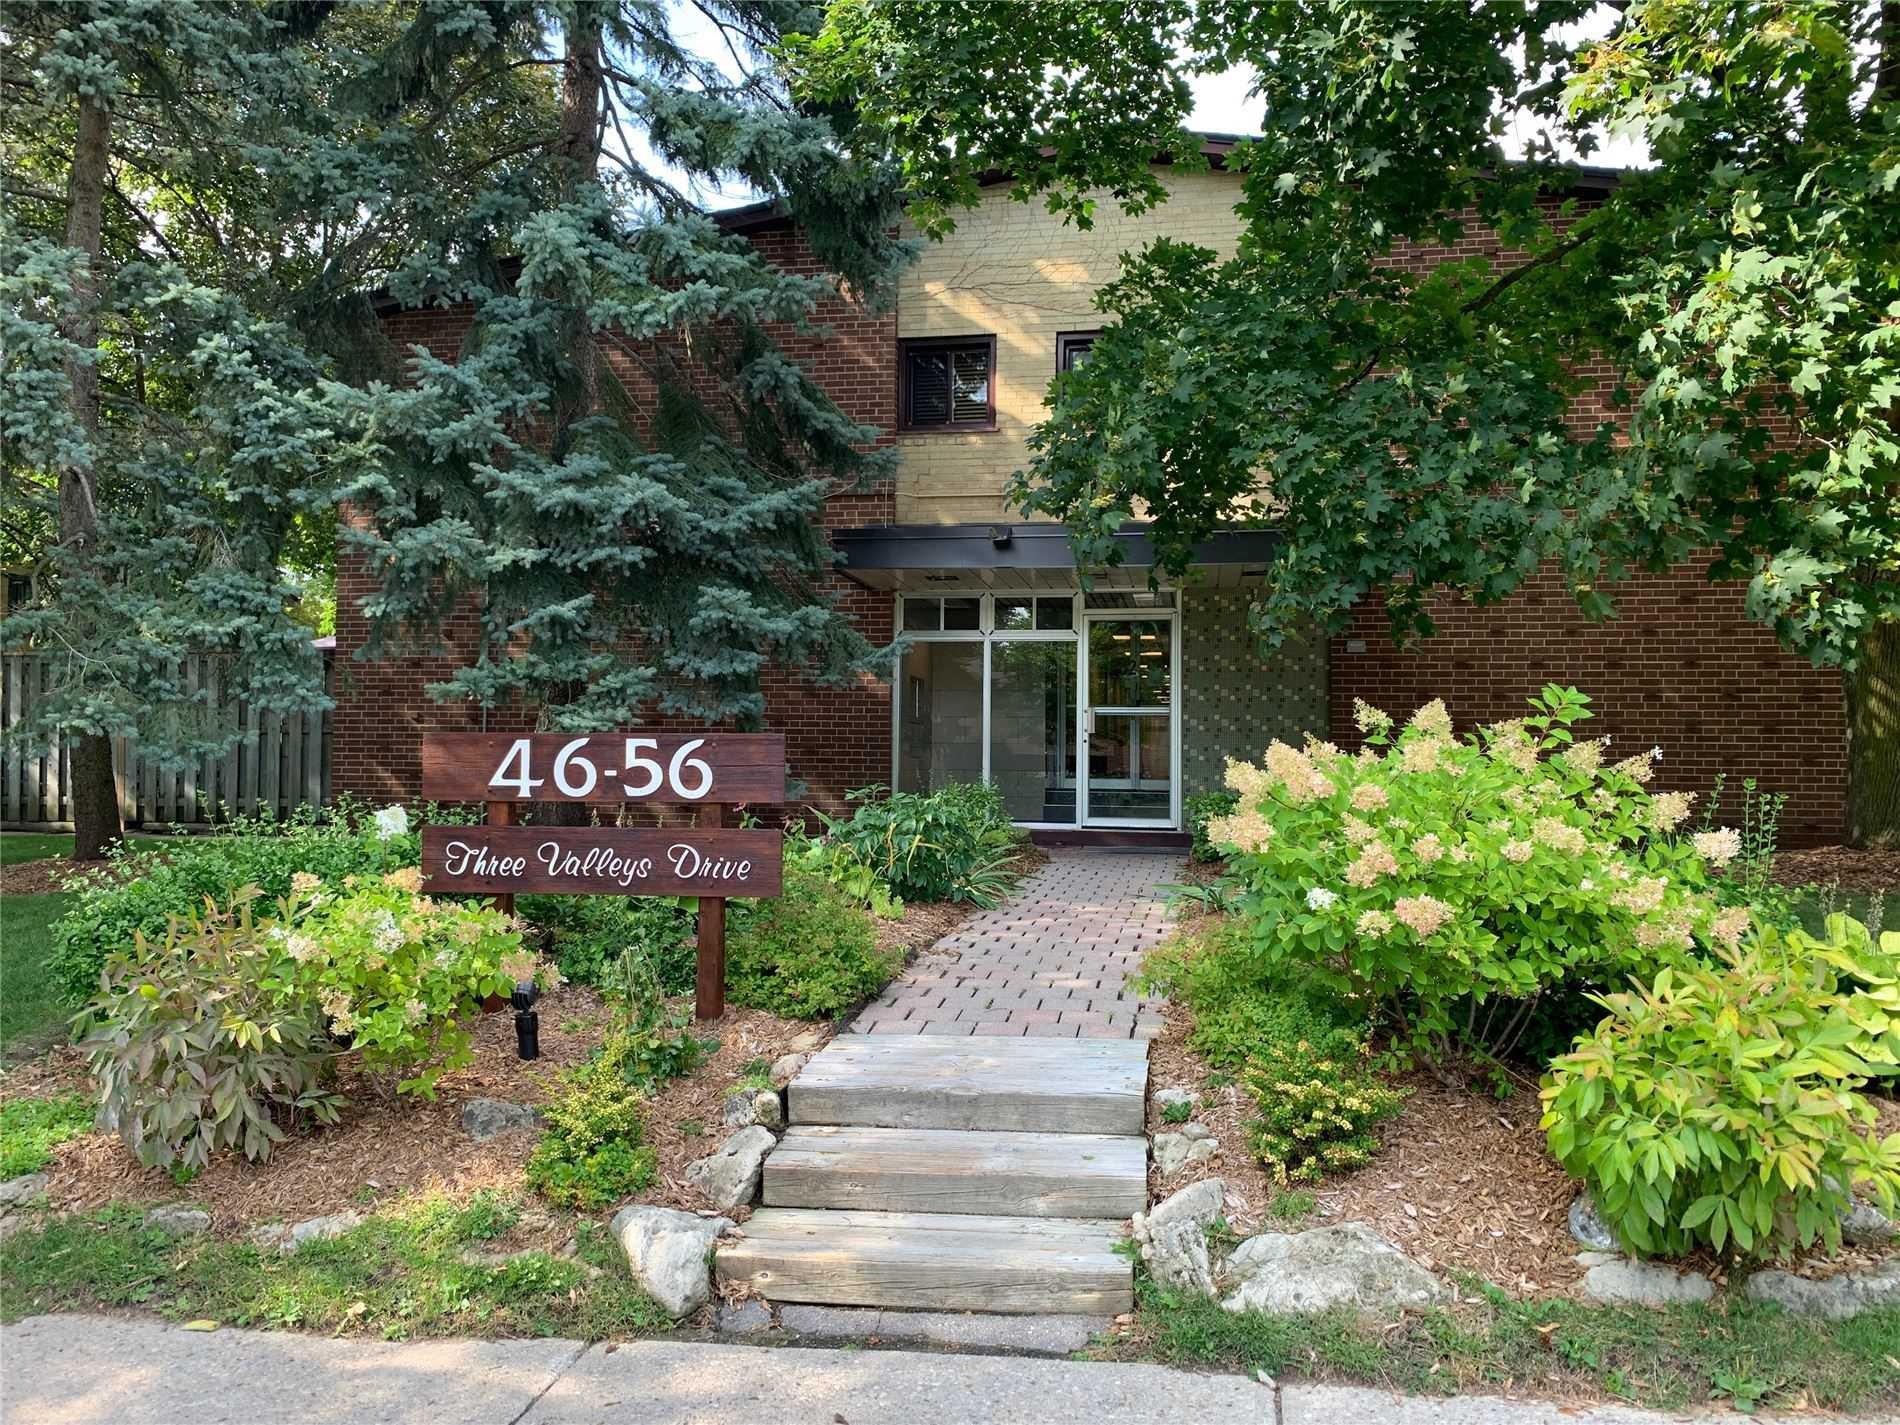 Main Photo: 3 54 Three Valleys Drive in Toronto: Parkwoods-Donalda Condo for sale (Toronto C13)  : MLS®# C4574491